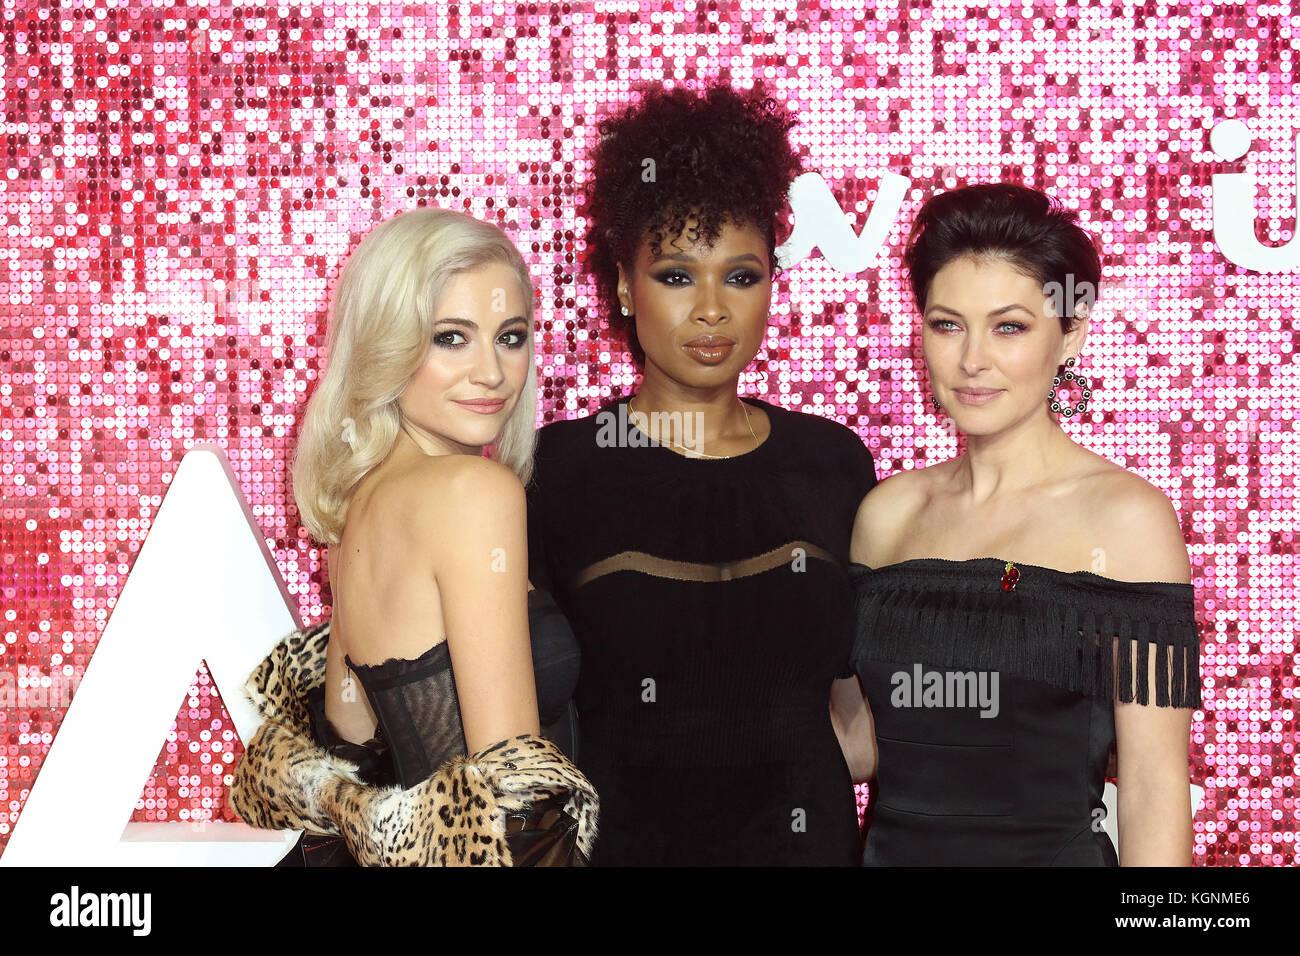 London, UK. 9th November, 2017. The Voice, Pixie Lott, Jennifer Hudson, Emma Willis, ITV GALA, London Palladium, - Stock Image